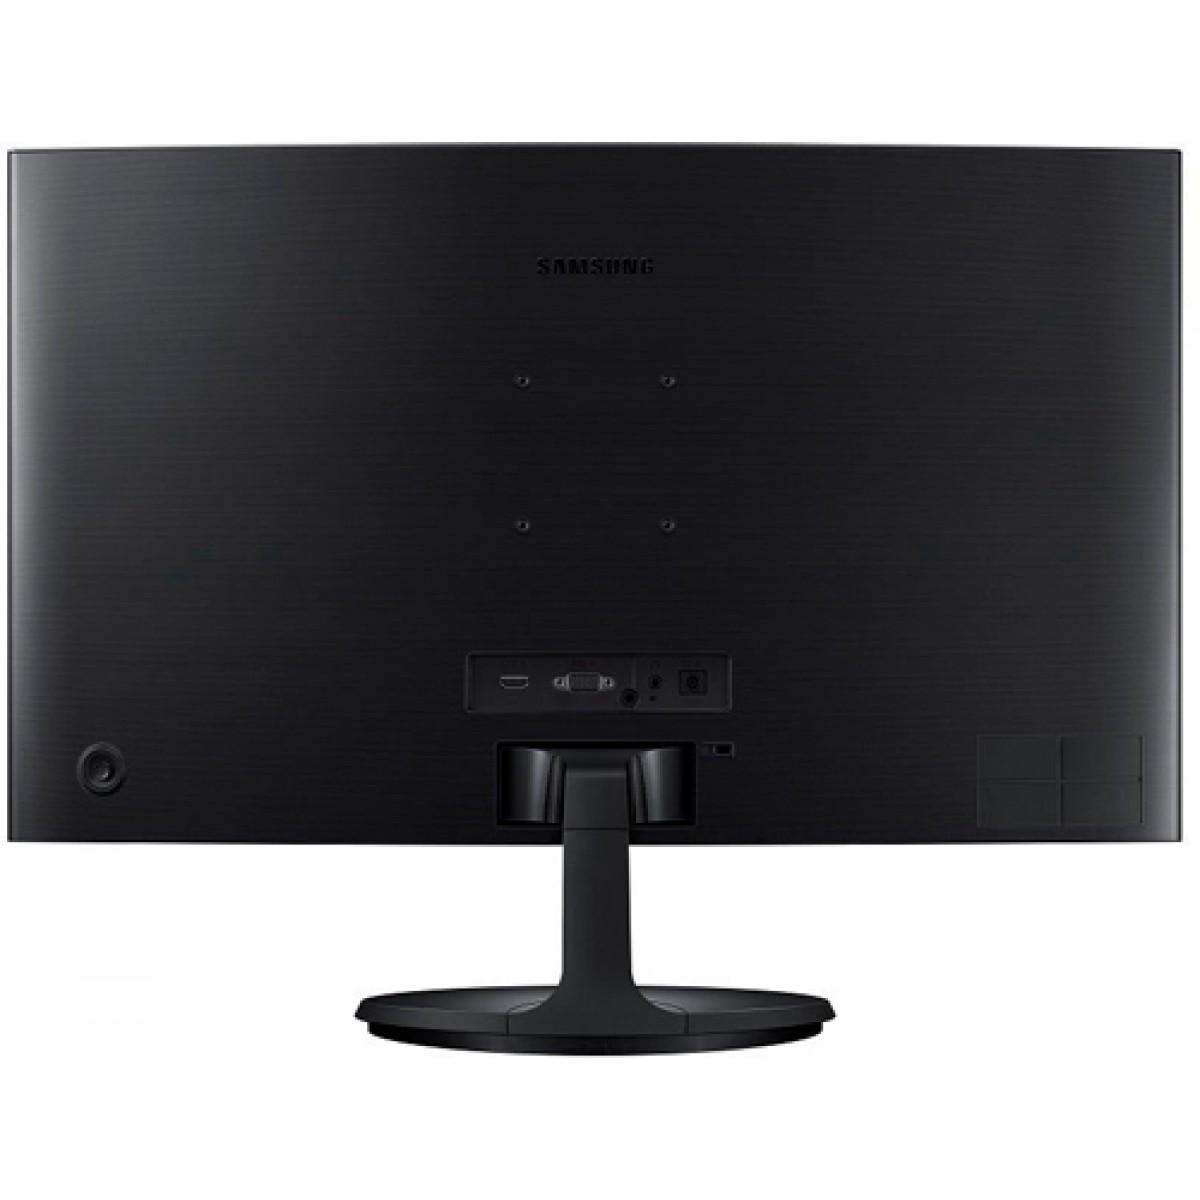 Monitor Gamer Samsung 27 Pol Curvo, Full HD, 60Hz, 4ms, LC27F390FHLMZD - Open Box